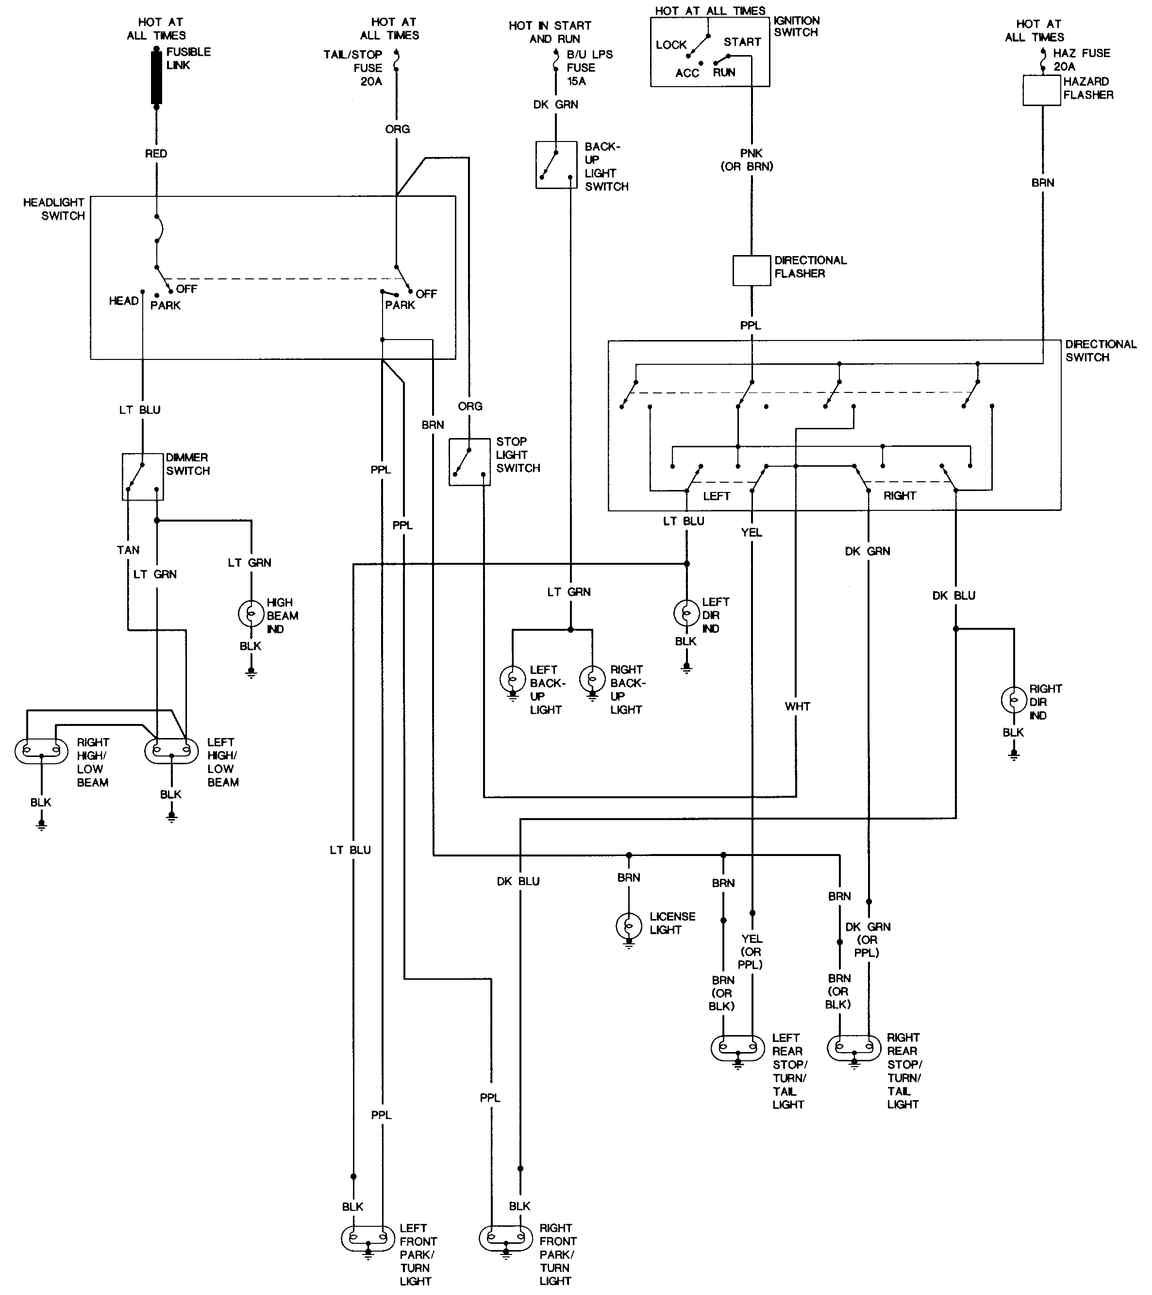 1980 oldsmobile ignition wiring diagram